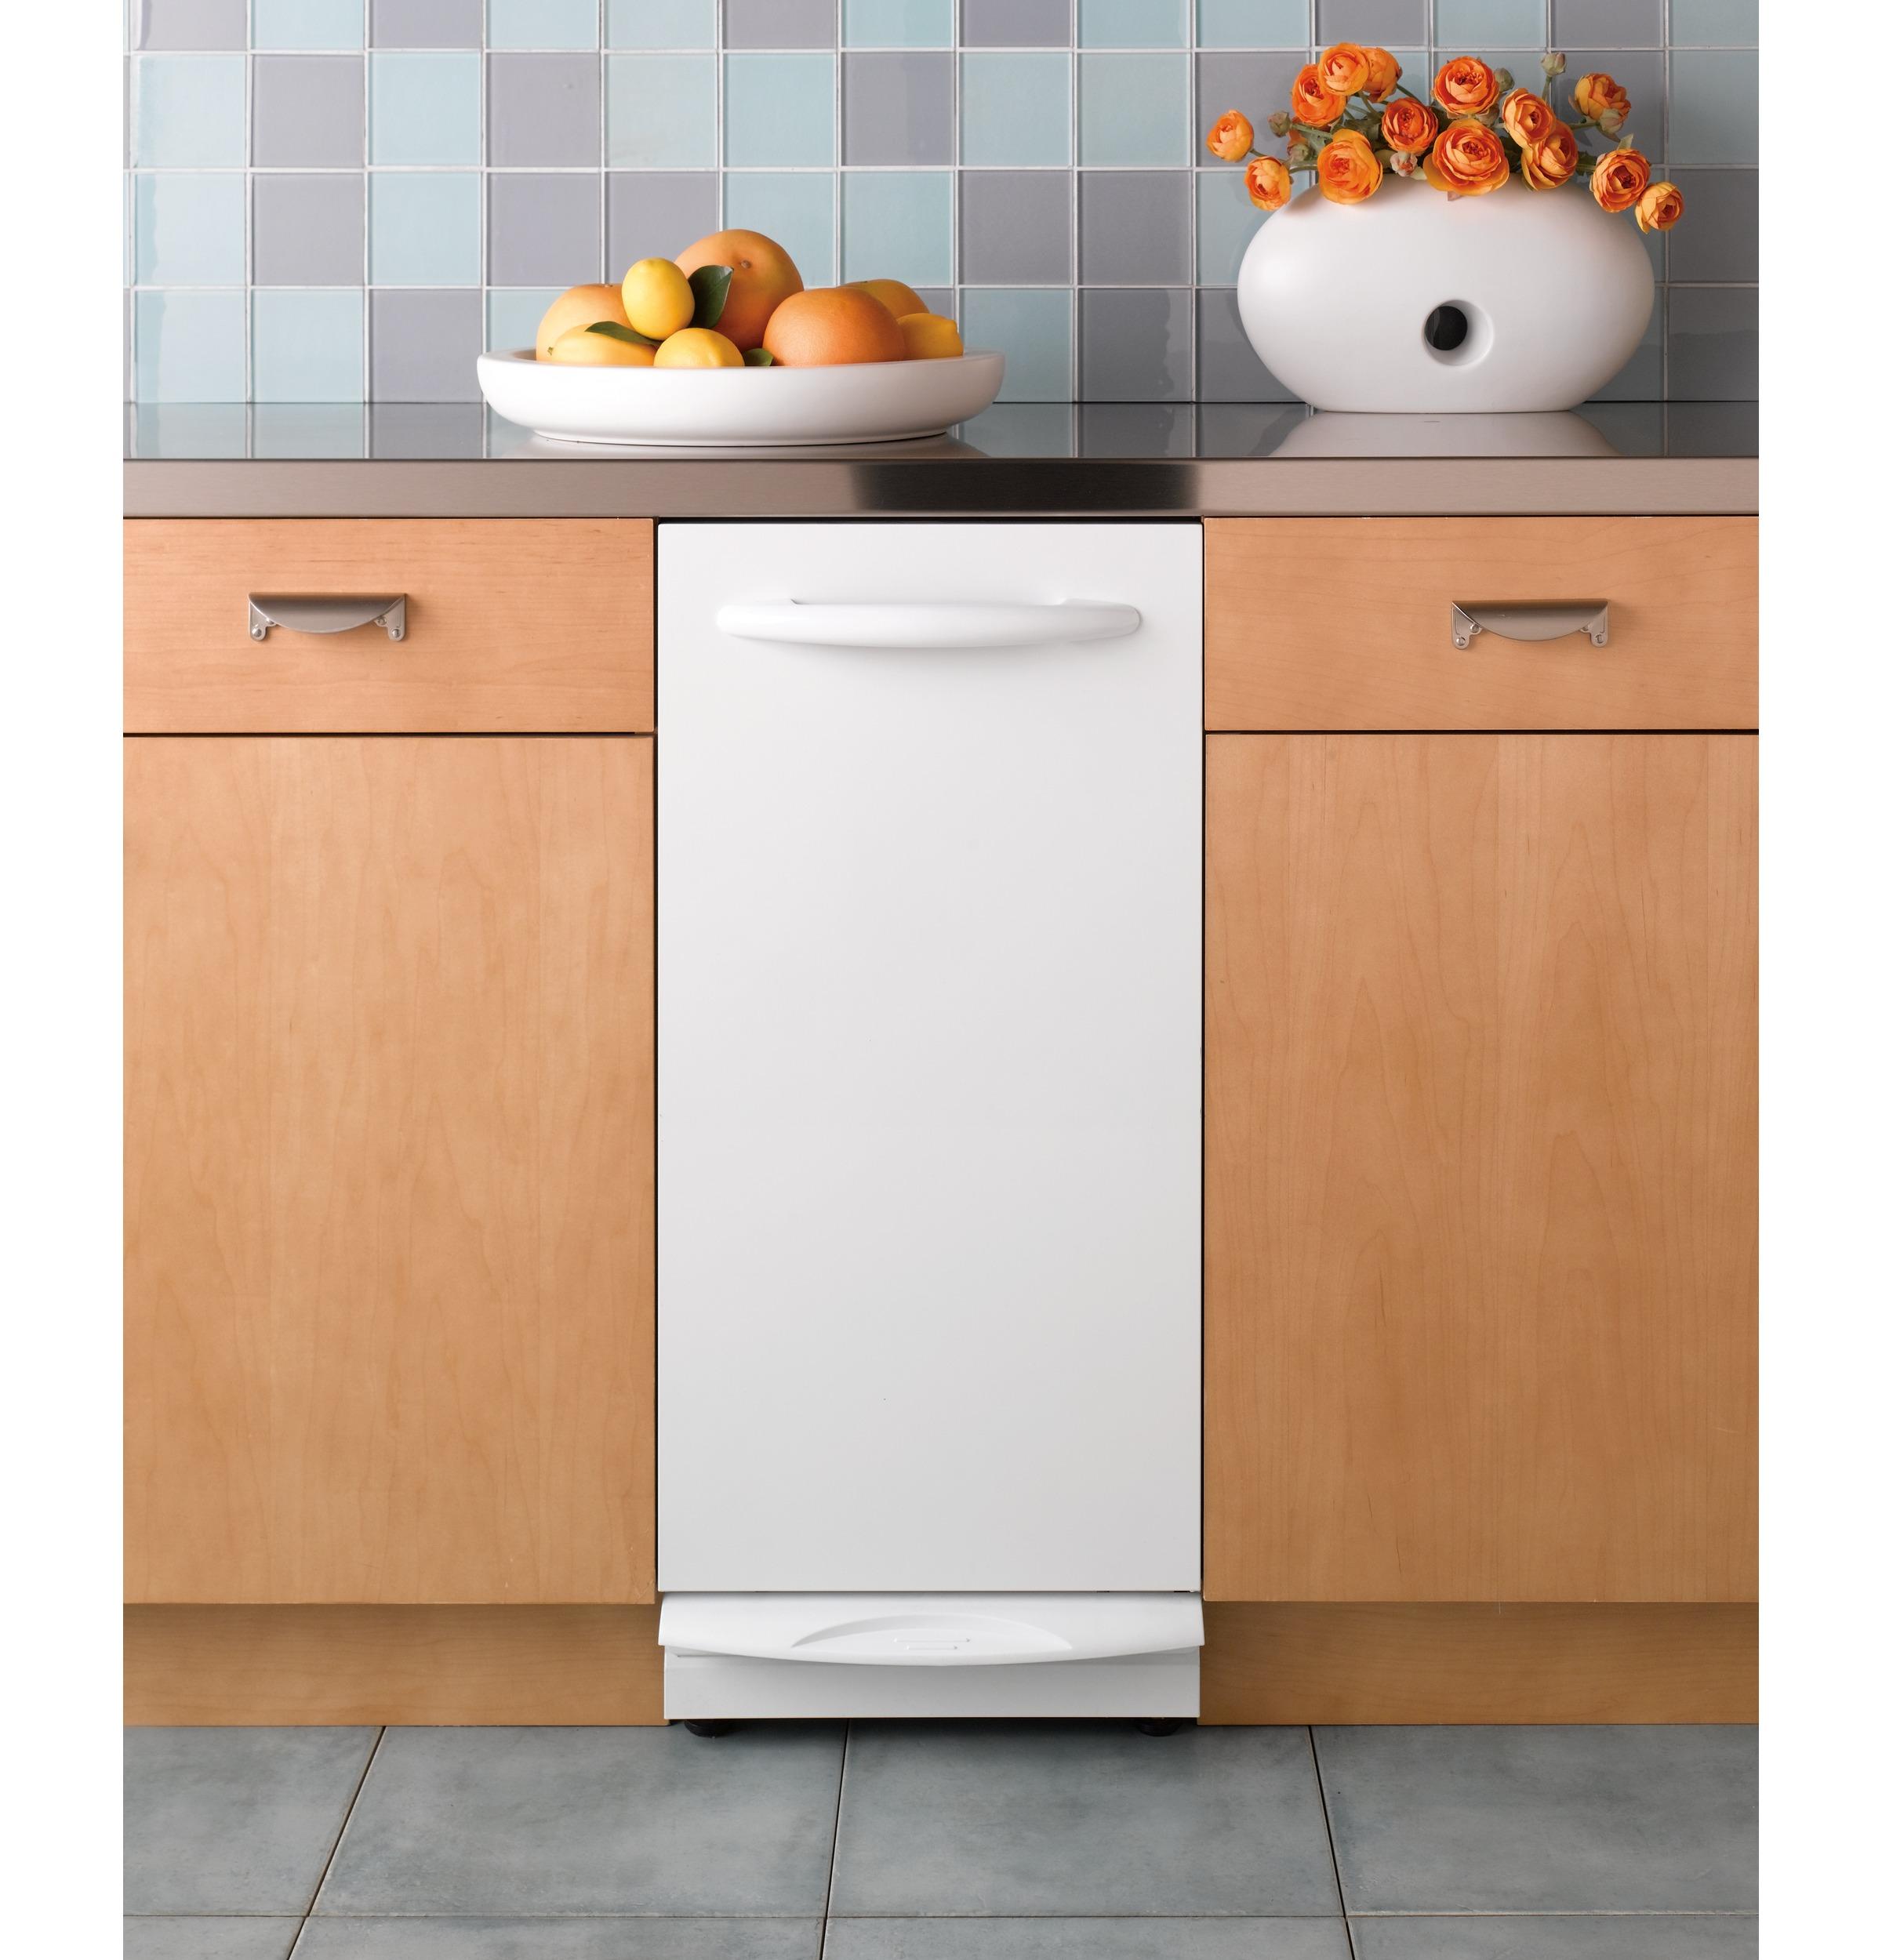 kitchenaid architect trash pactor kucs03ftwh reviews prices